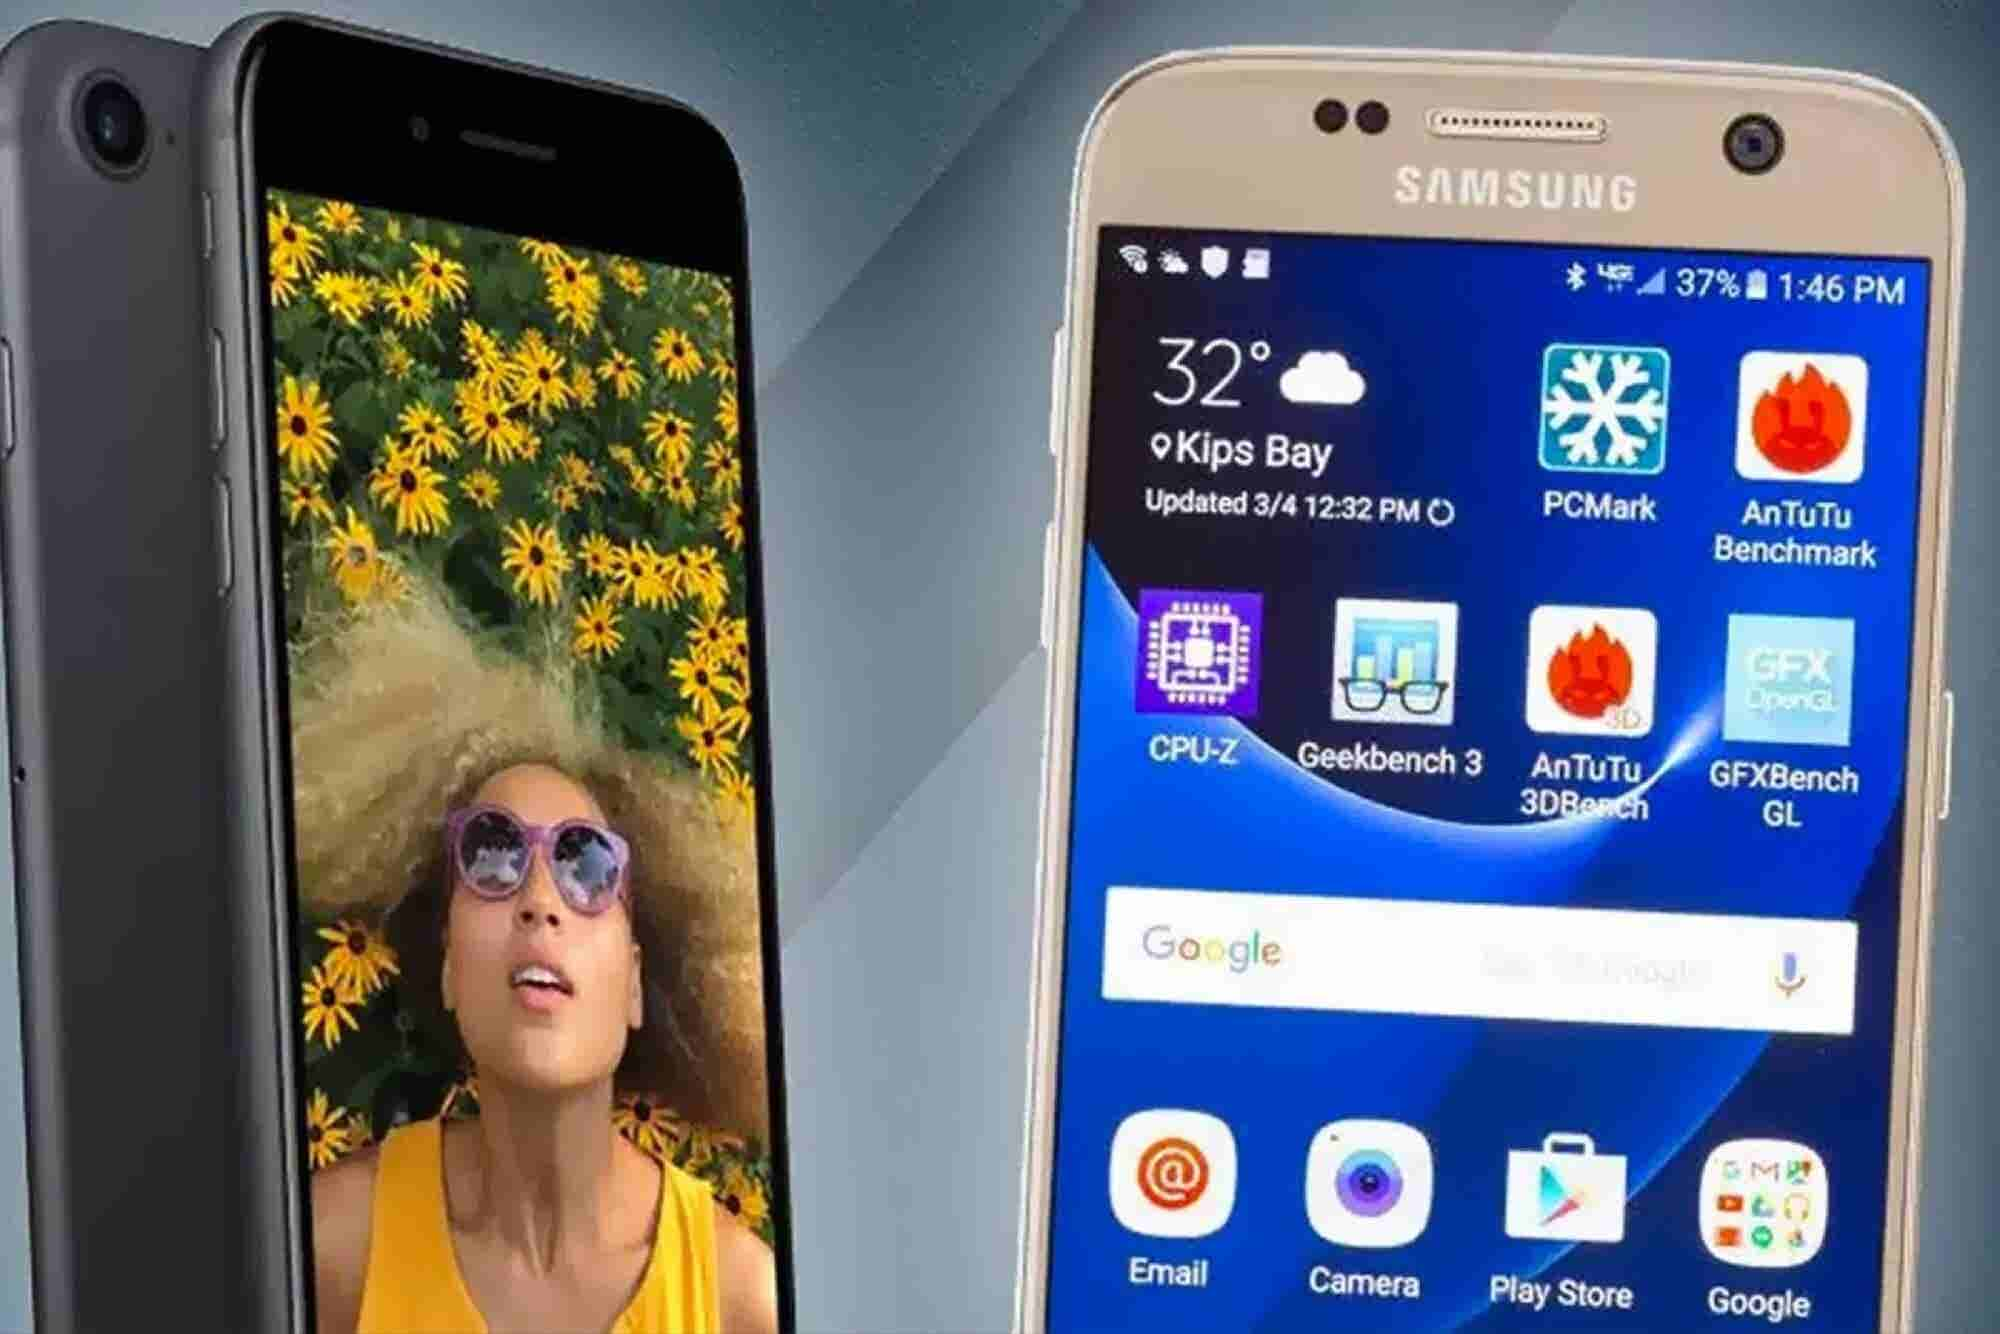 Samsung Galaxy S8 Rumored to Ditch Headphone Jack